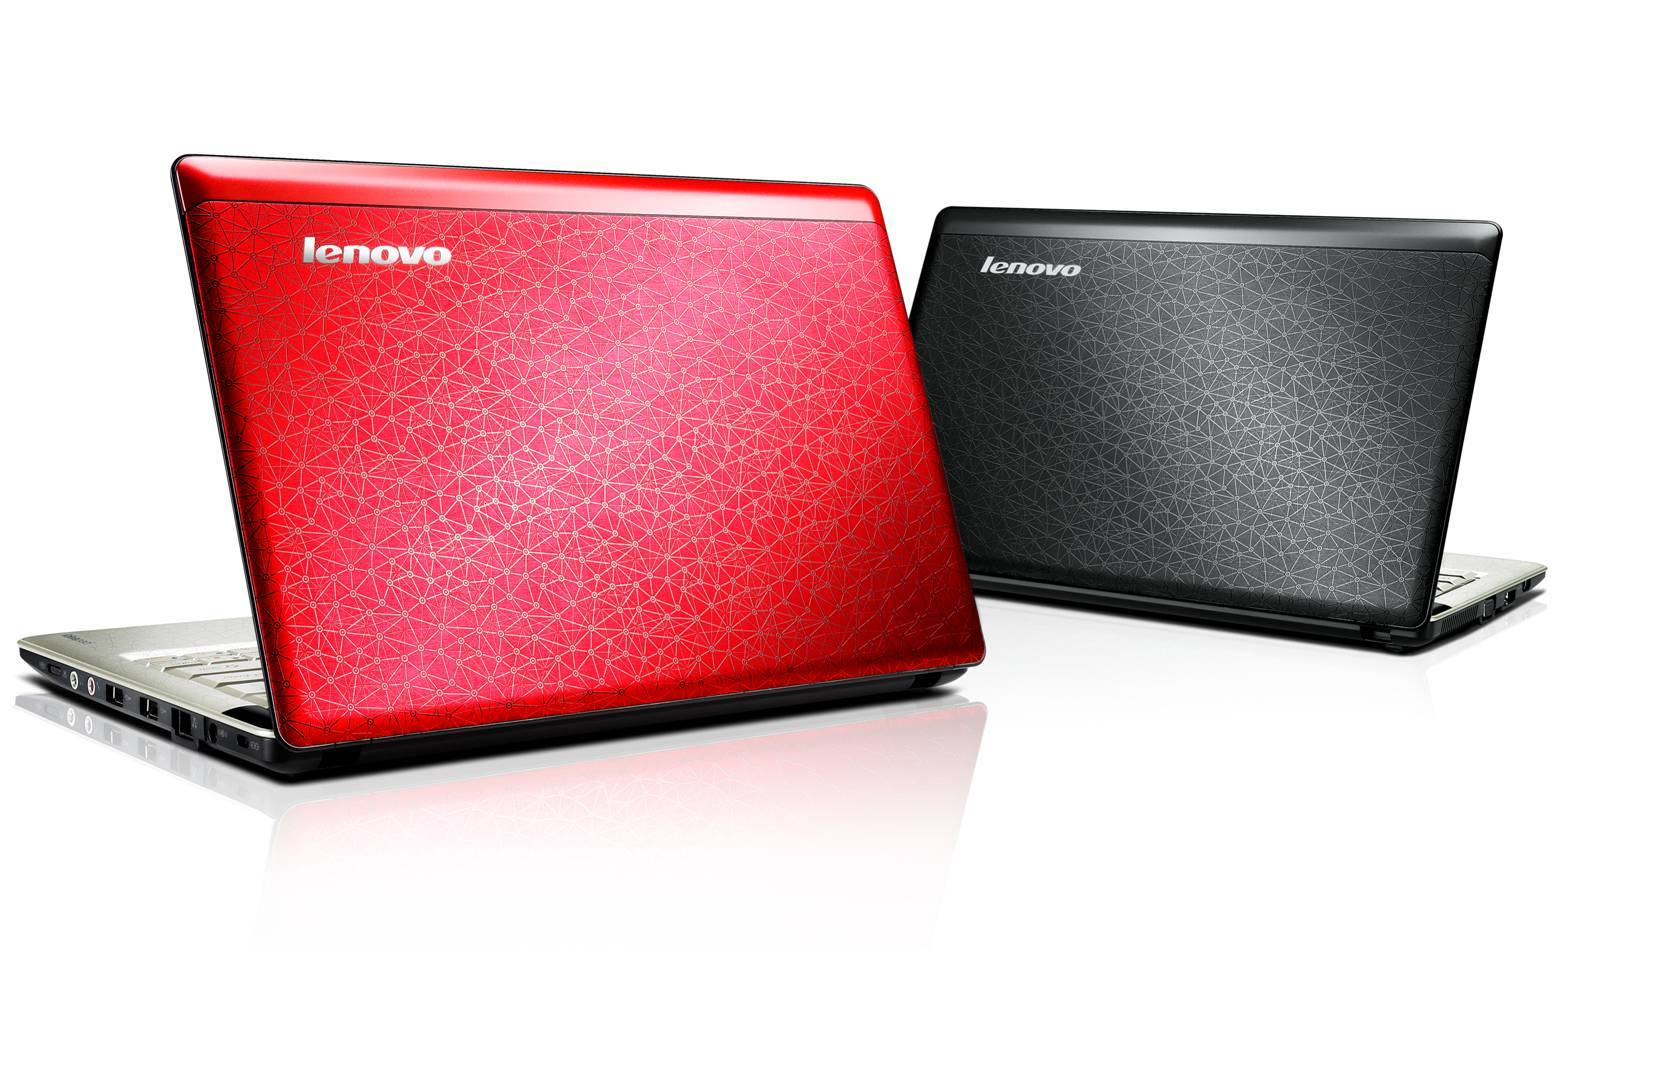 عيوب لاب توب Lenovo